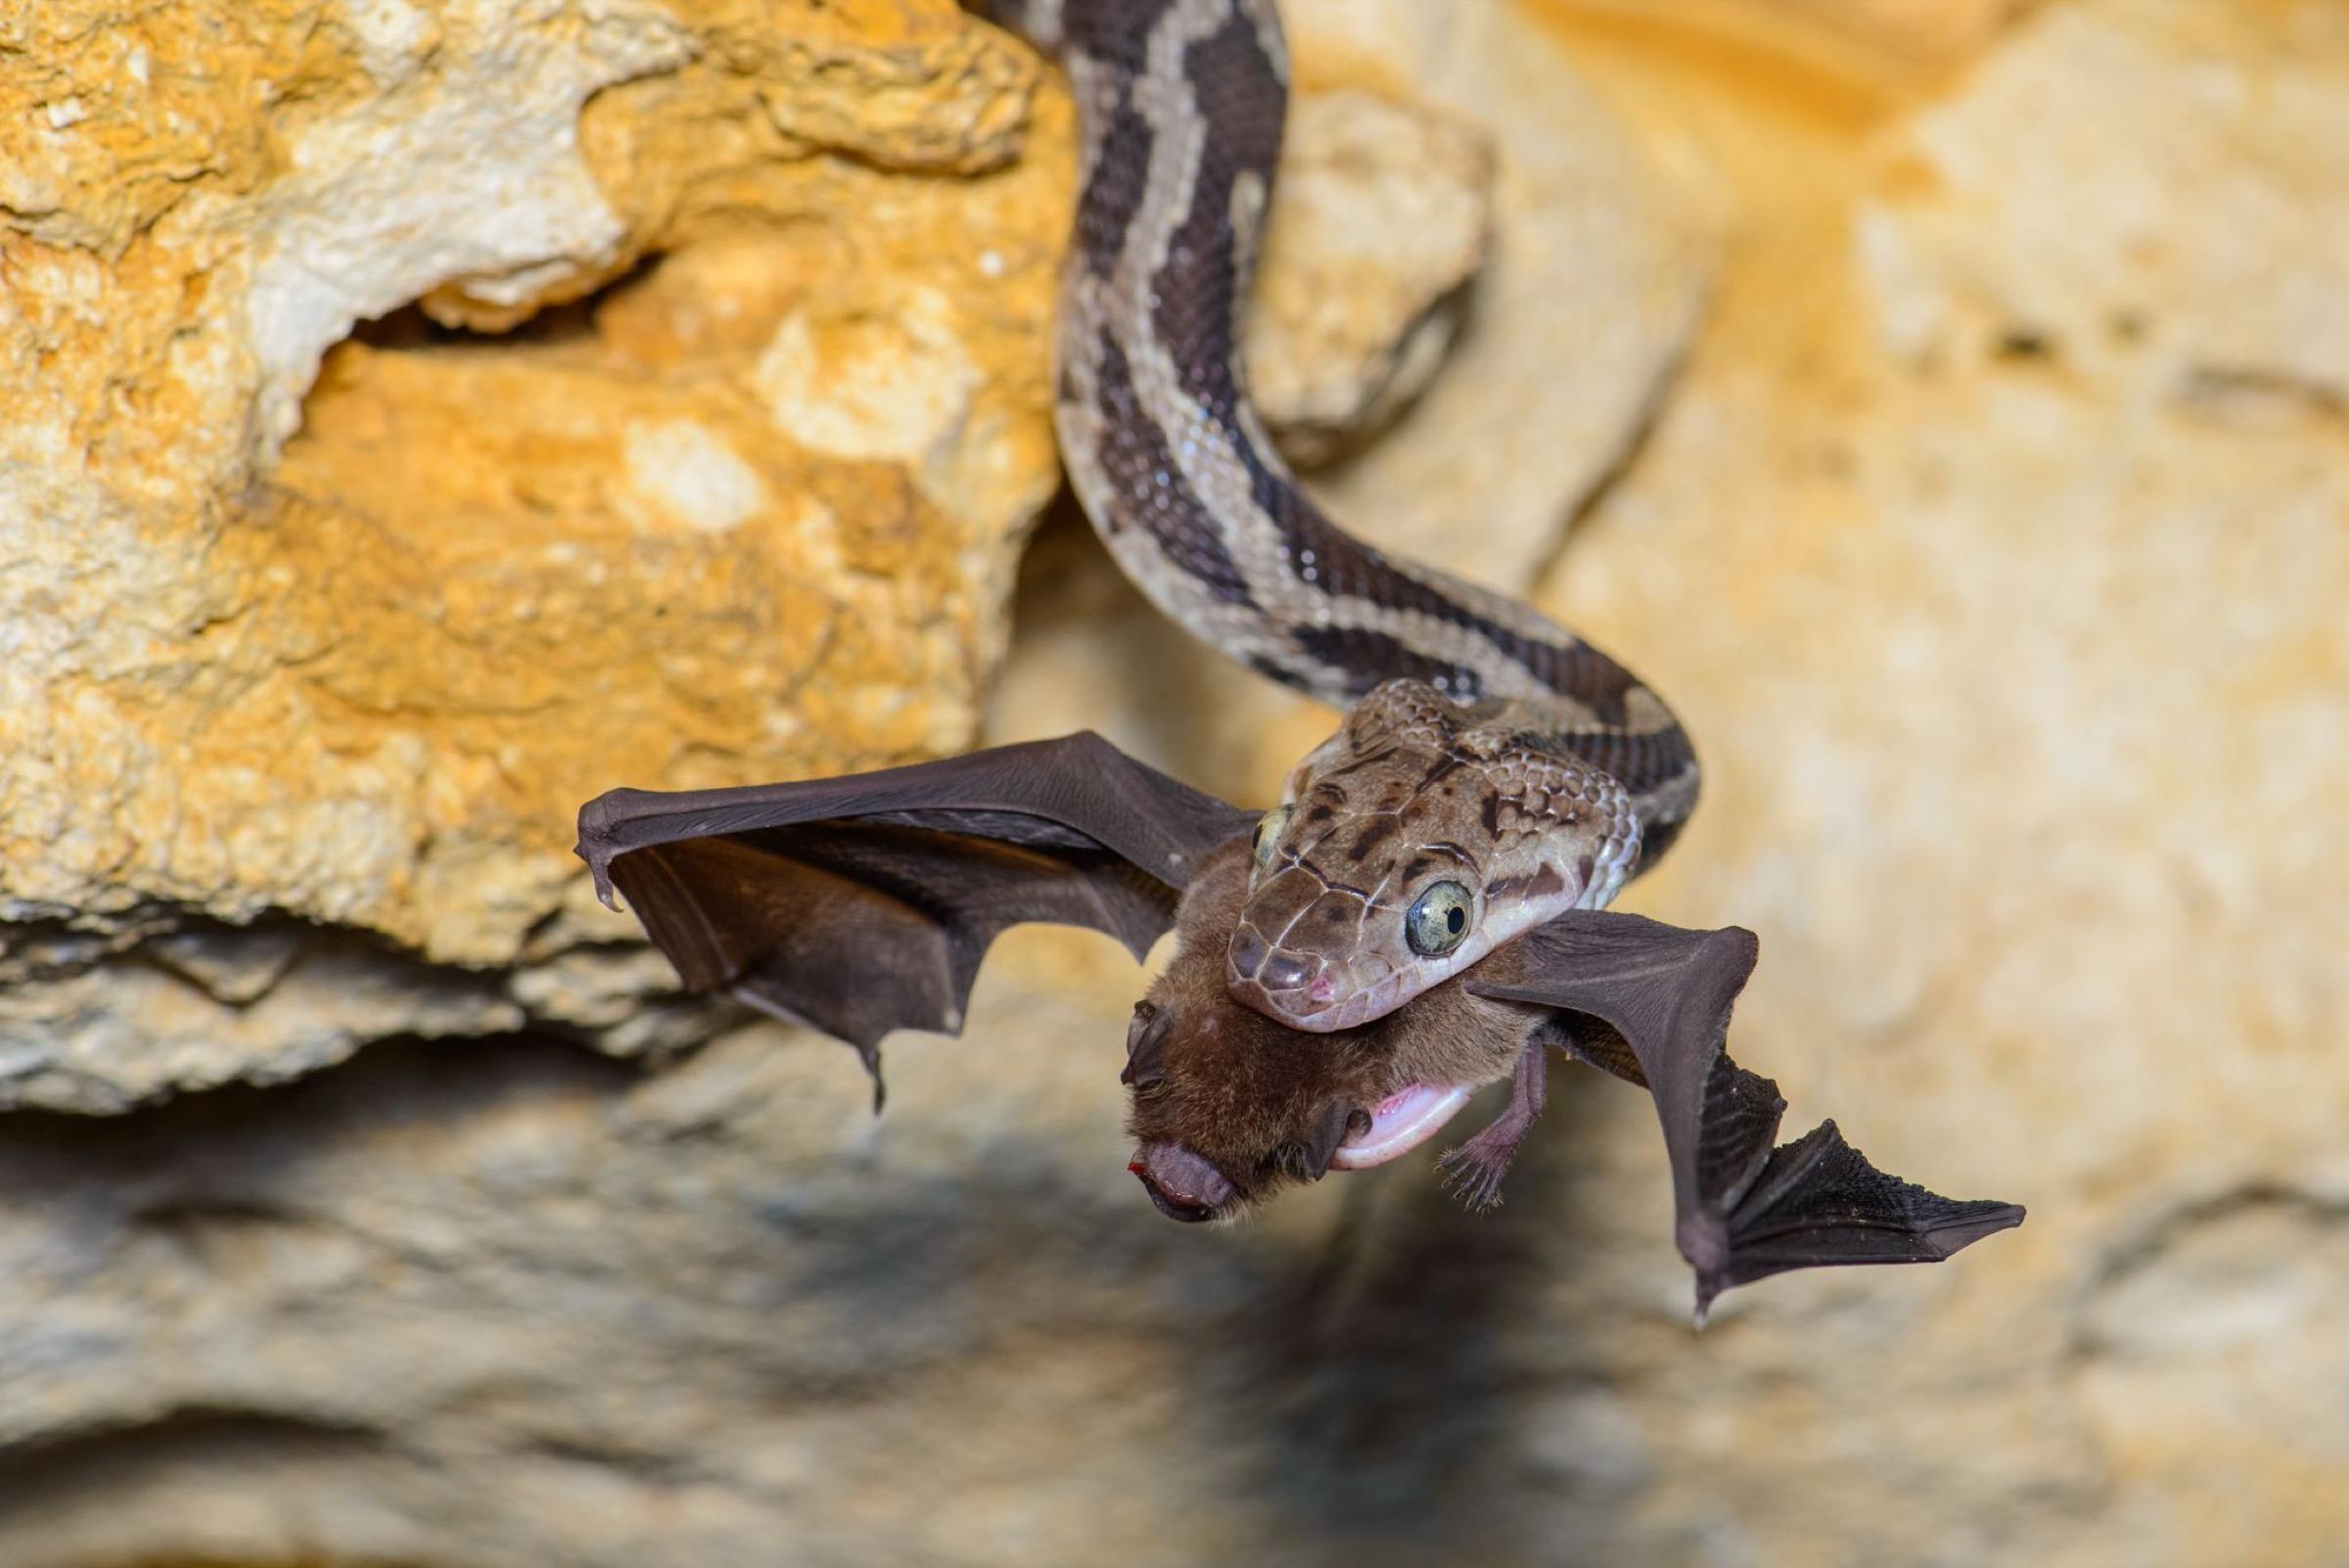 Mesoamerican mustached bat (Pteronotus parnellii mesoamericanus)